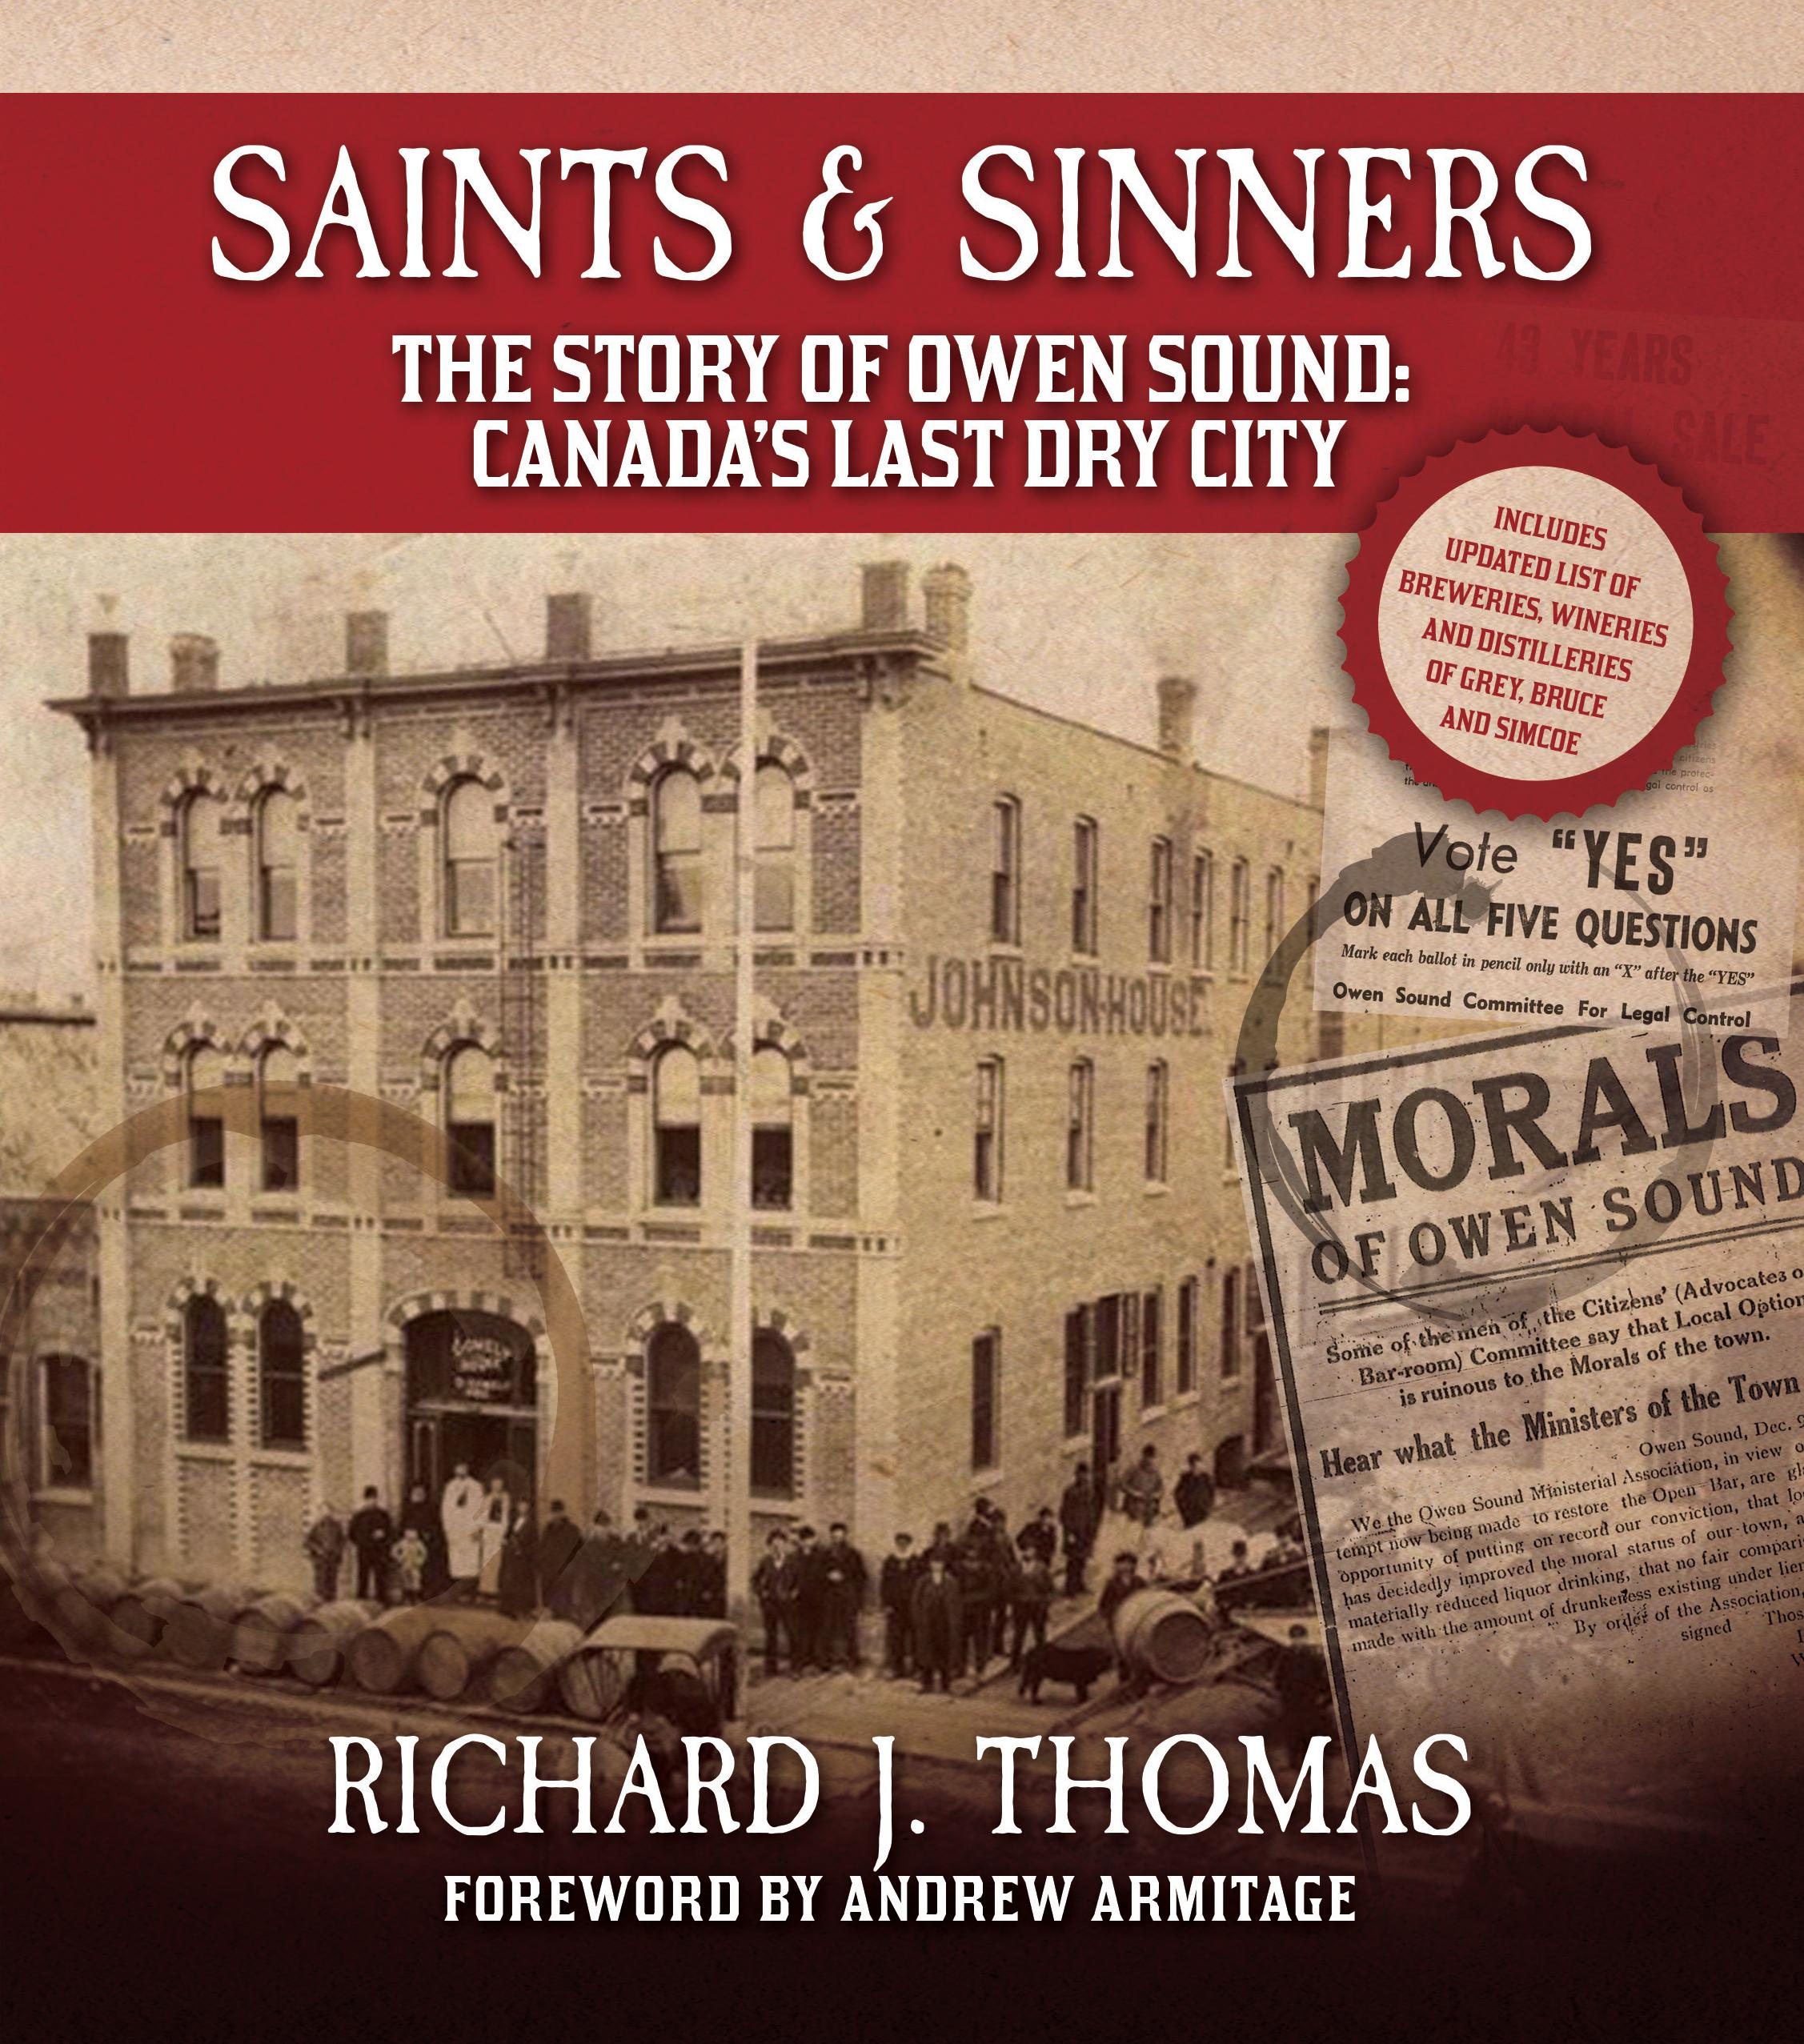 Saints & Sinners The Story of Owen Sound: Canada's Last Dry City, by Richard J. Thomas